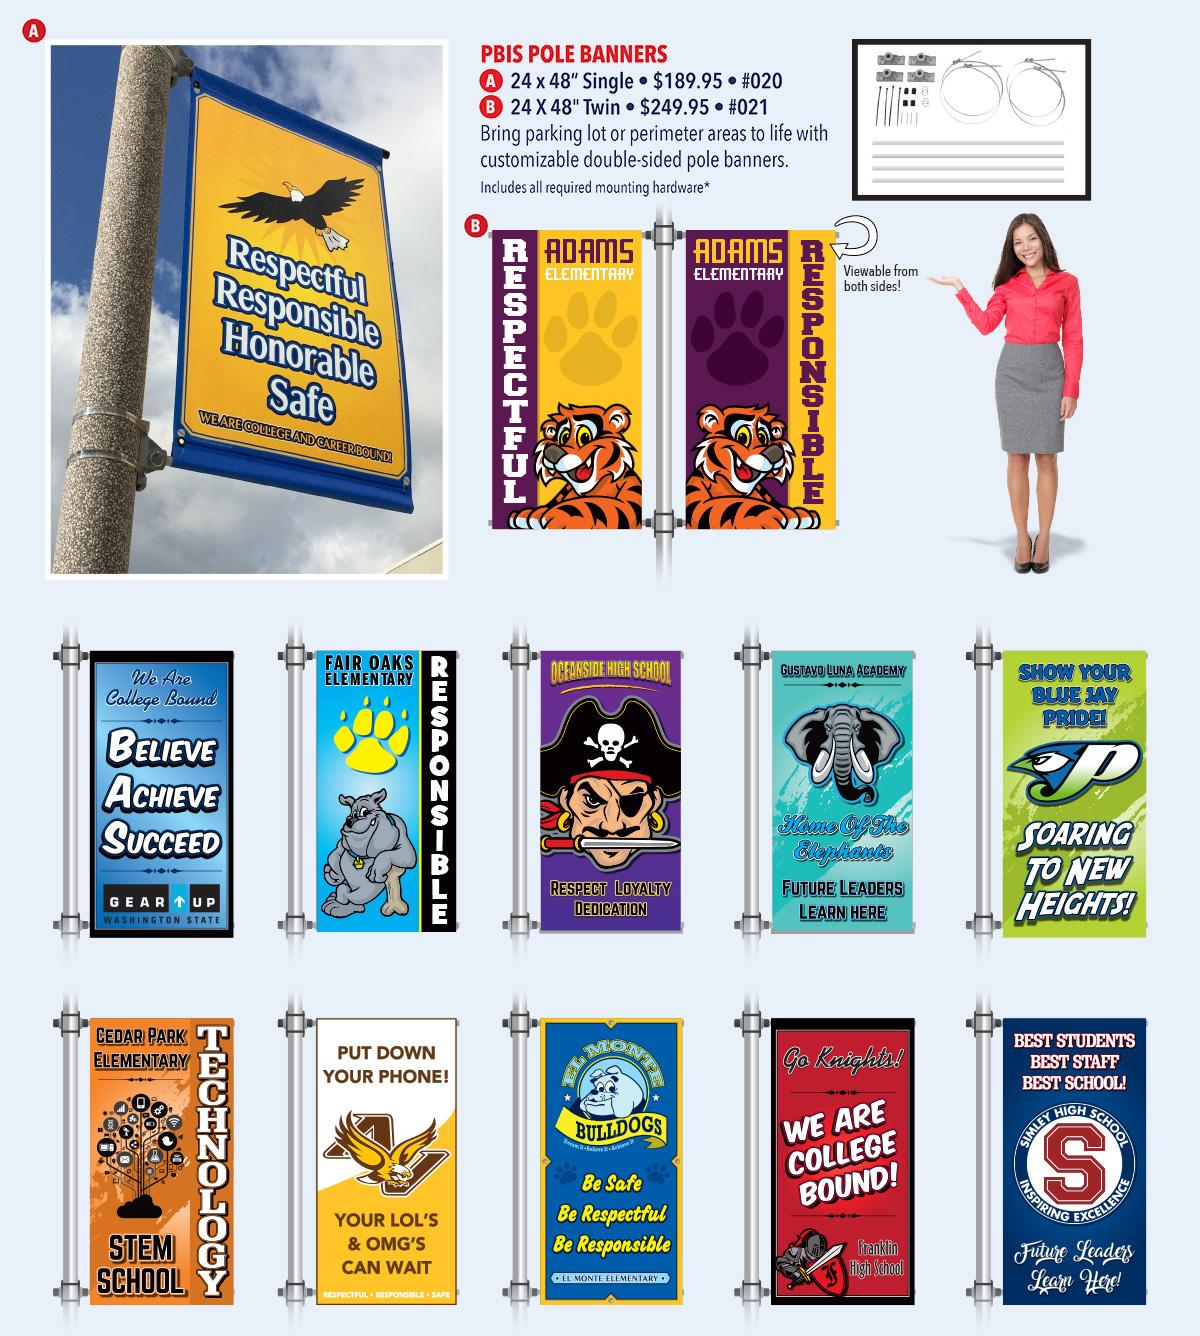 Custom PBIS Pole Banners